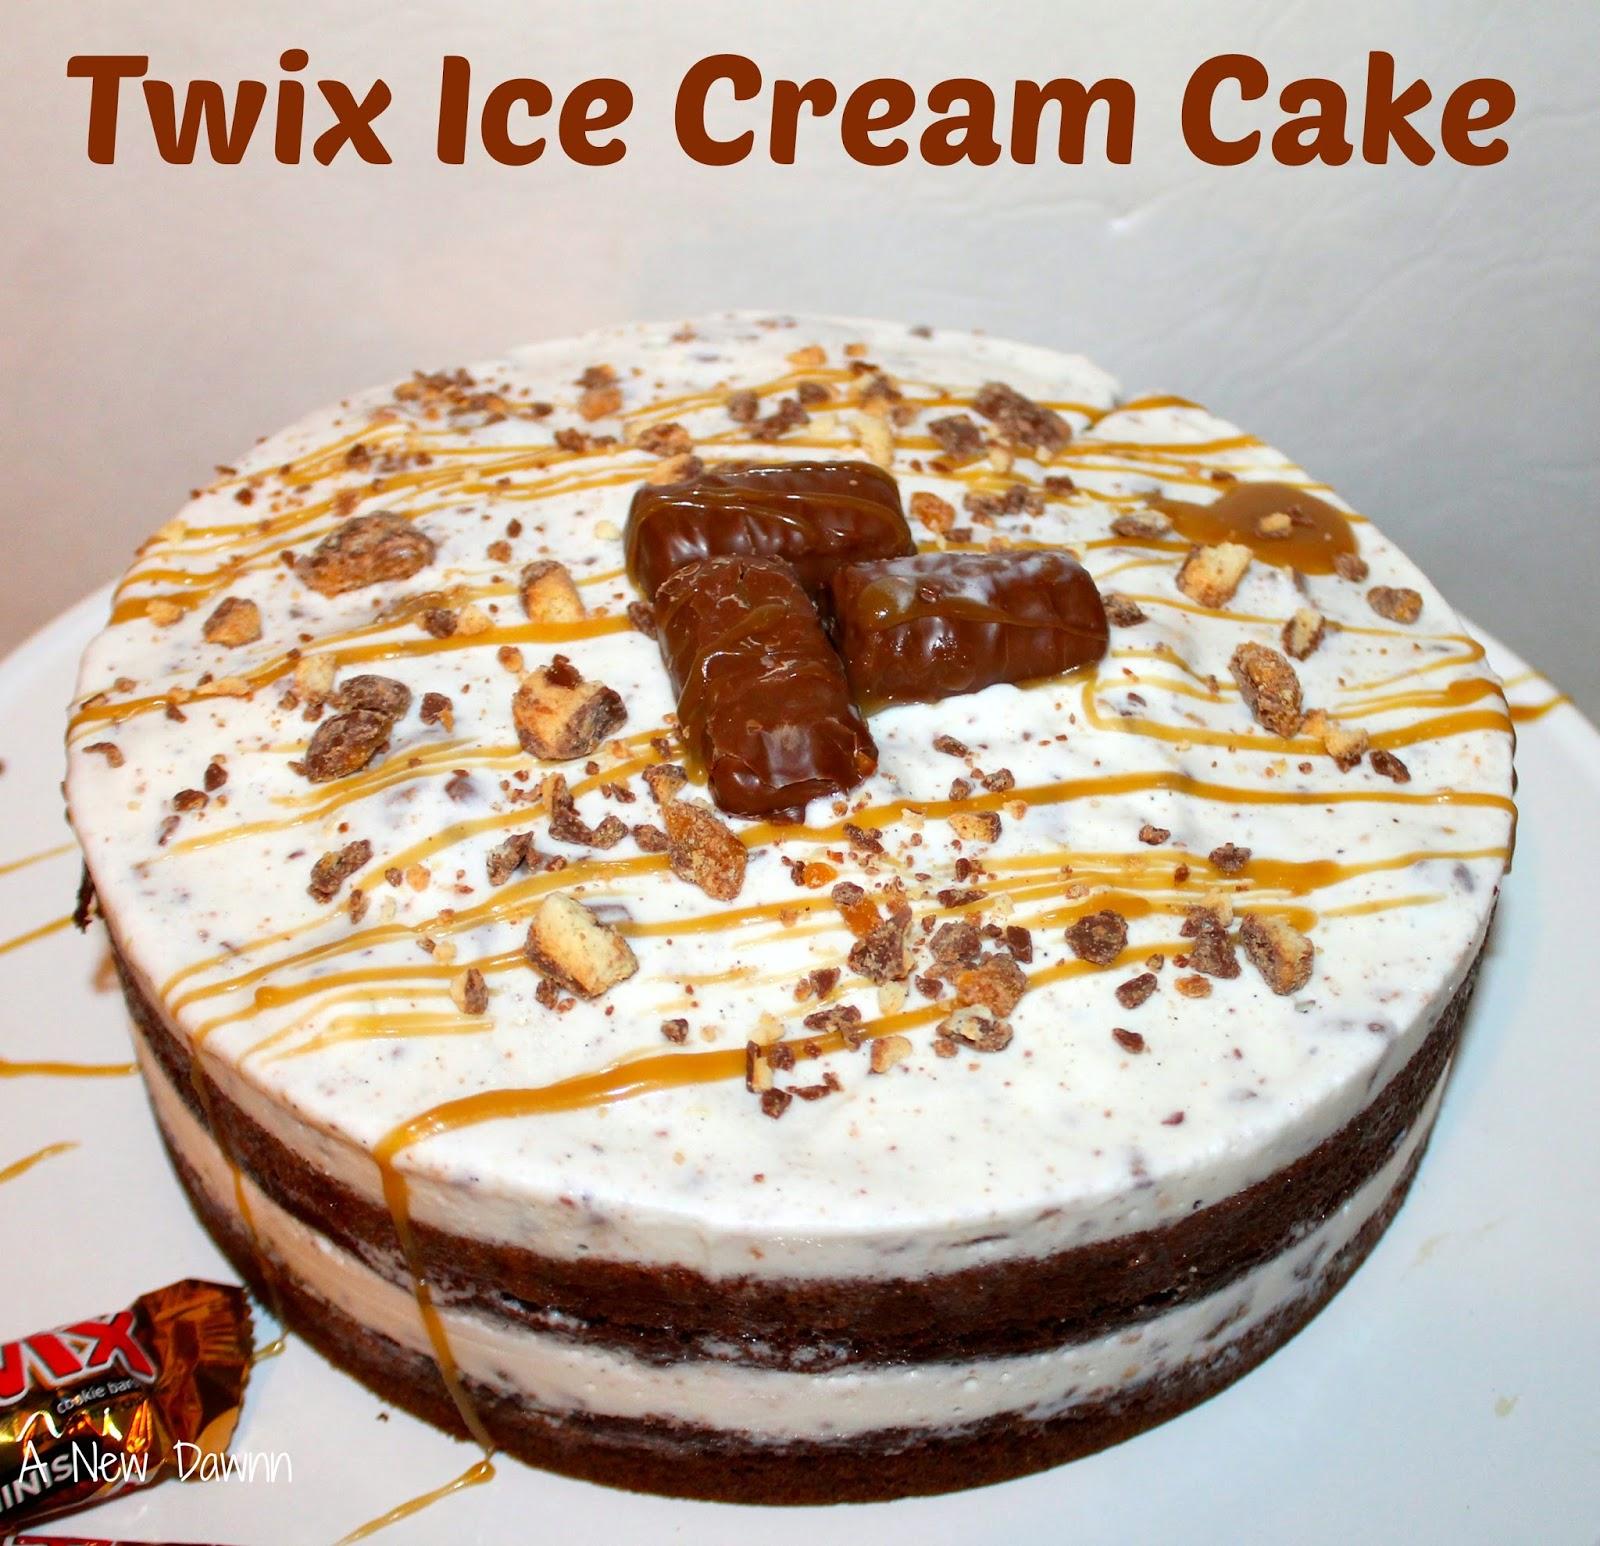 Where To Buy Twix Ice Cream Cake